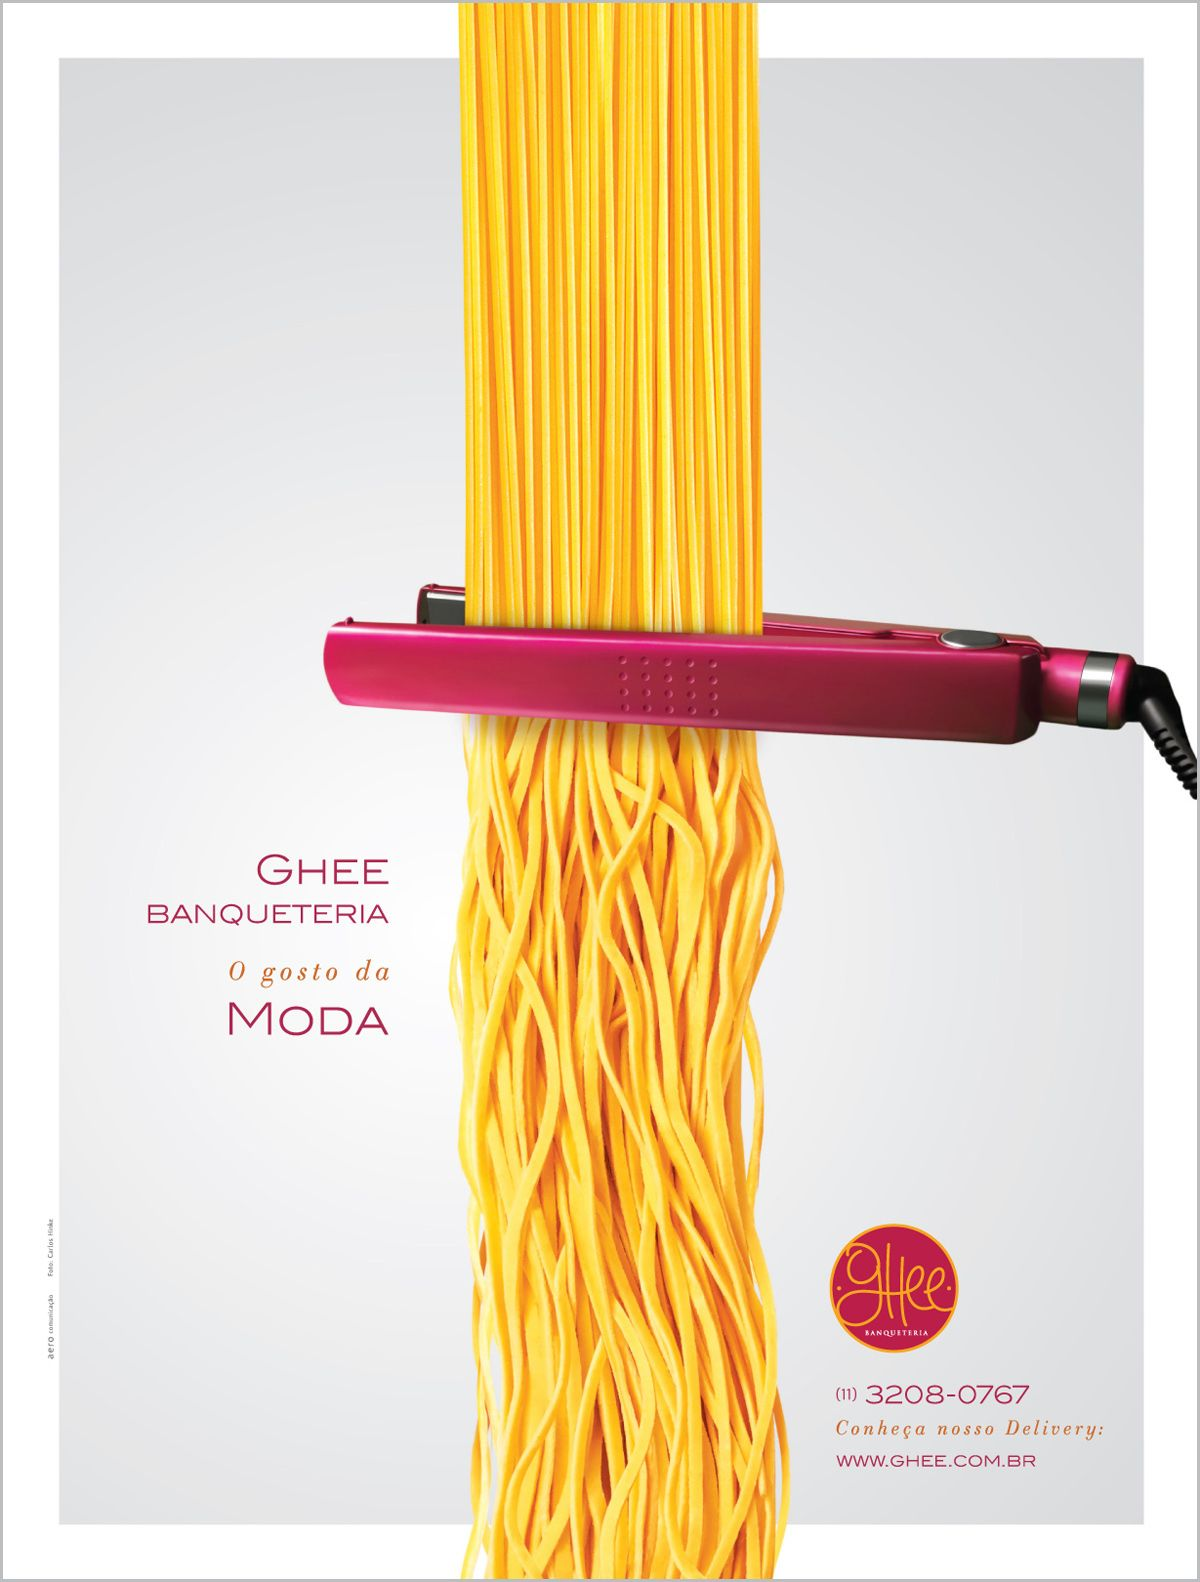 Ghee Banqueteria #advertisement